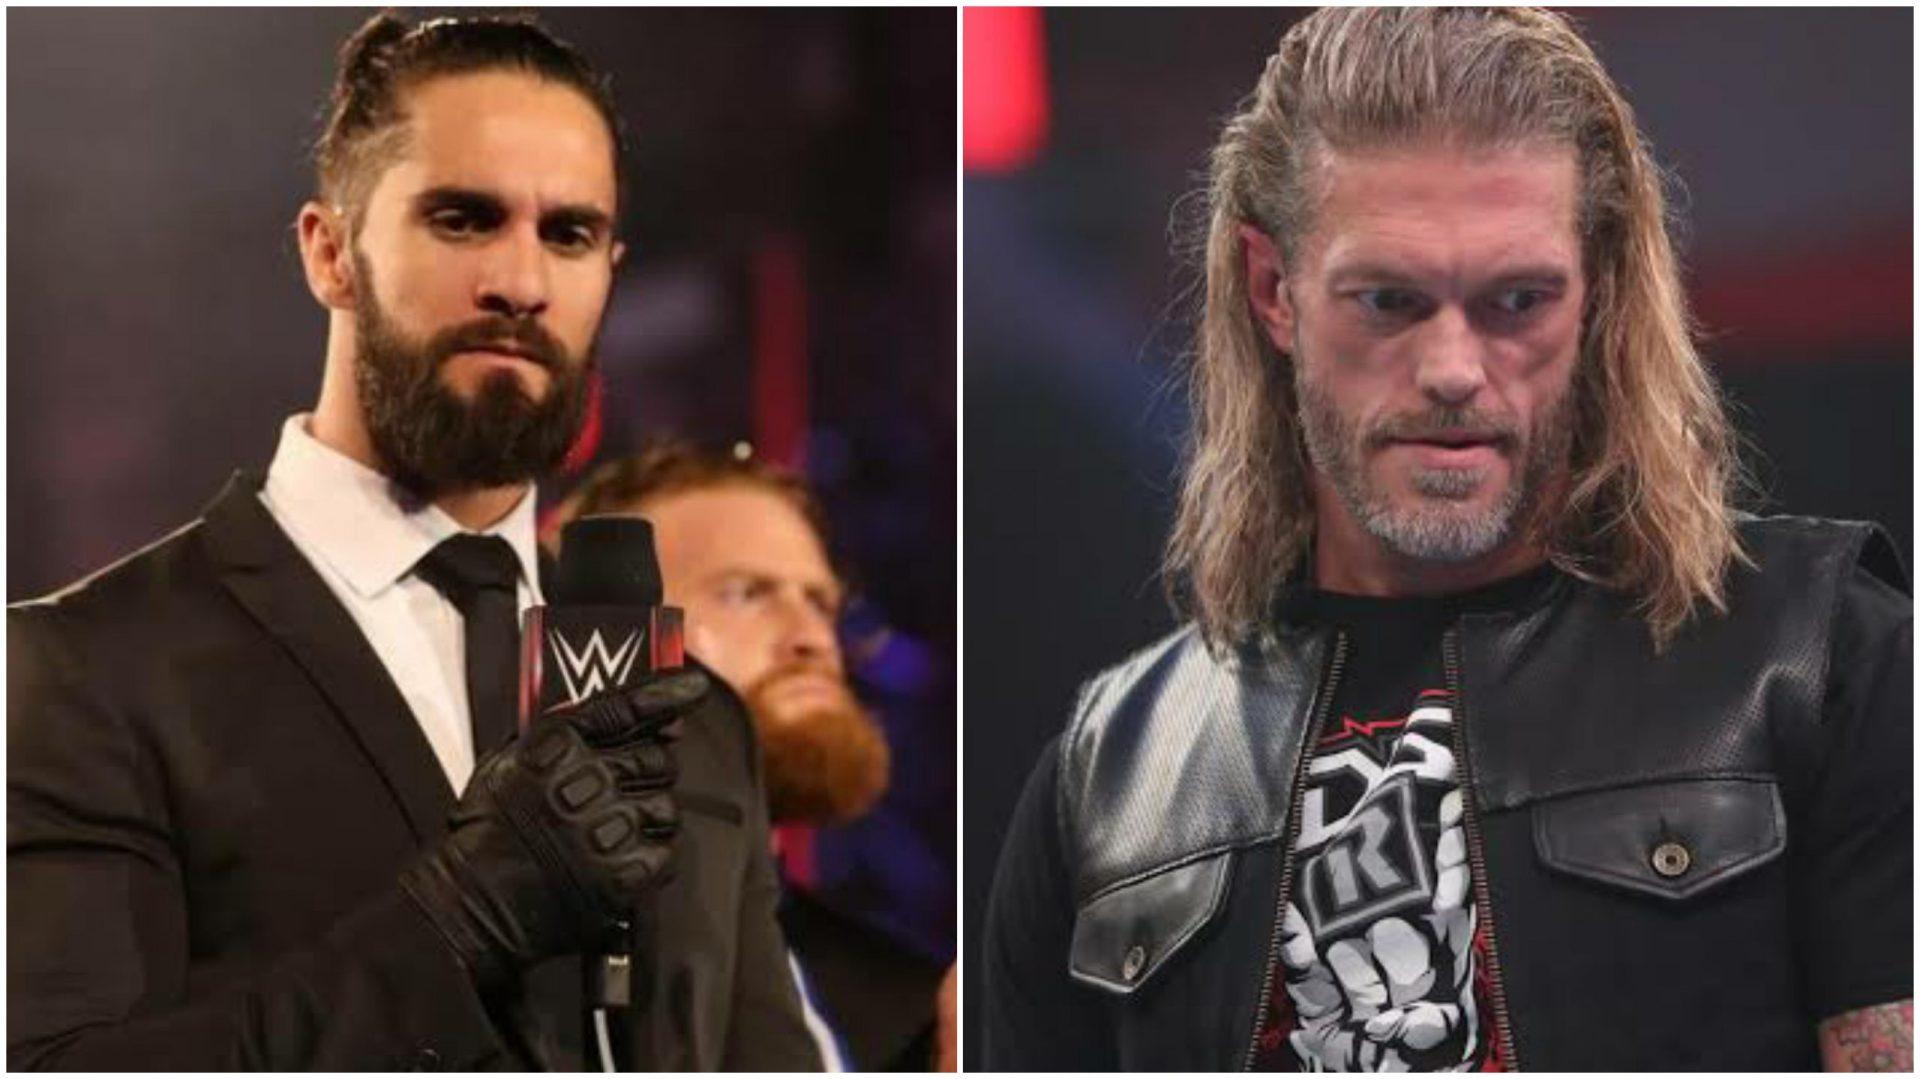 Edge mocks Seth Rollins at WWE Bump - THE SPORTS ROOM